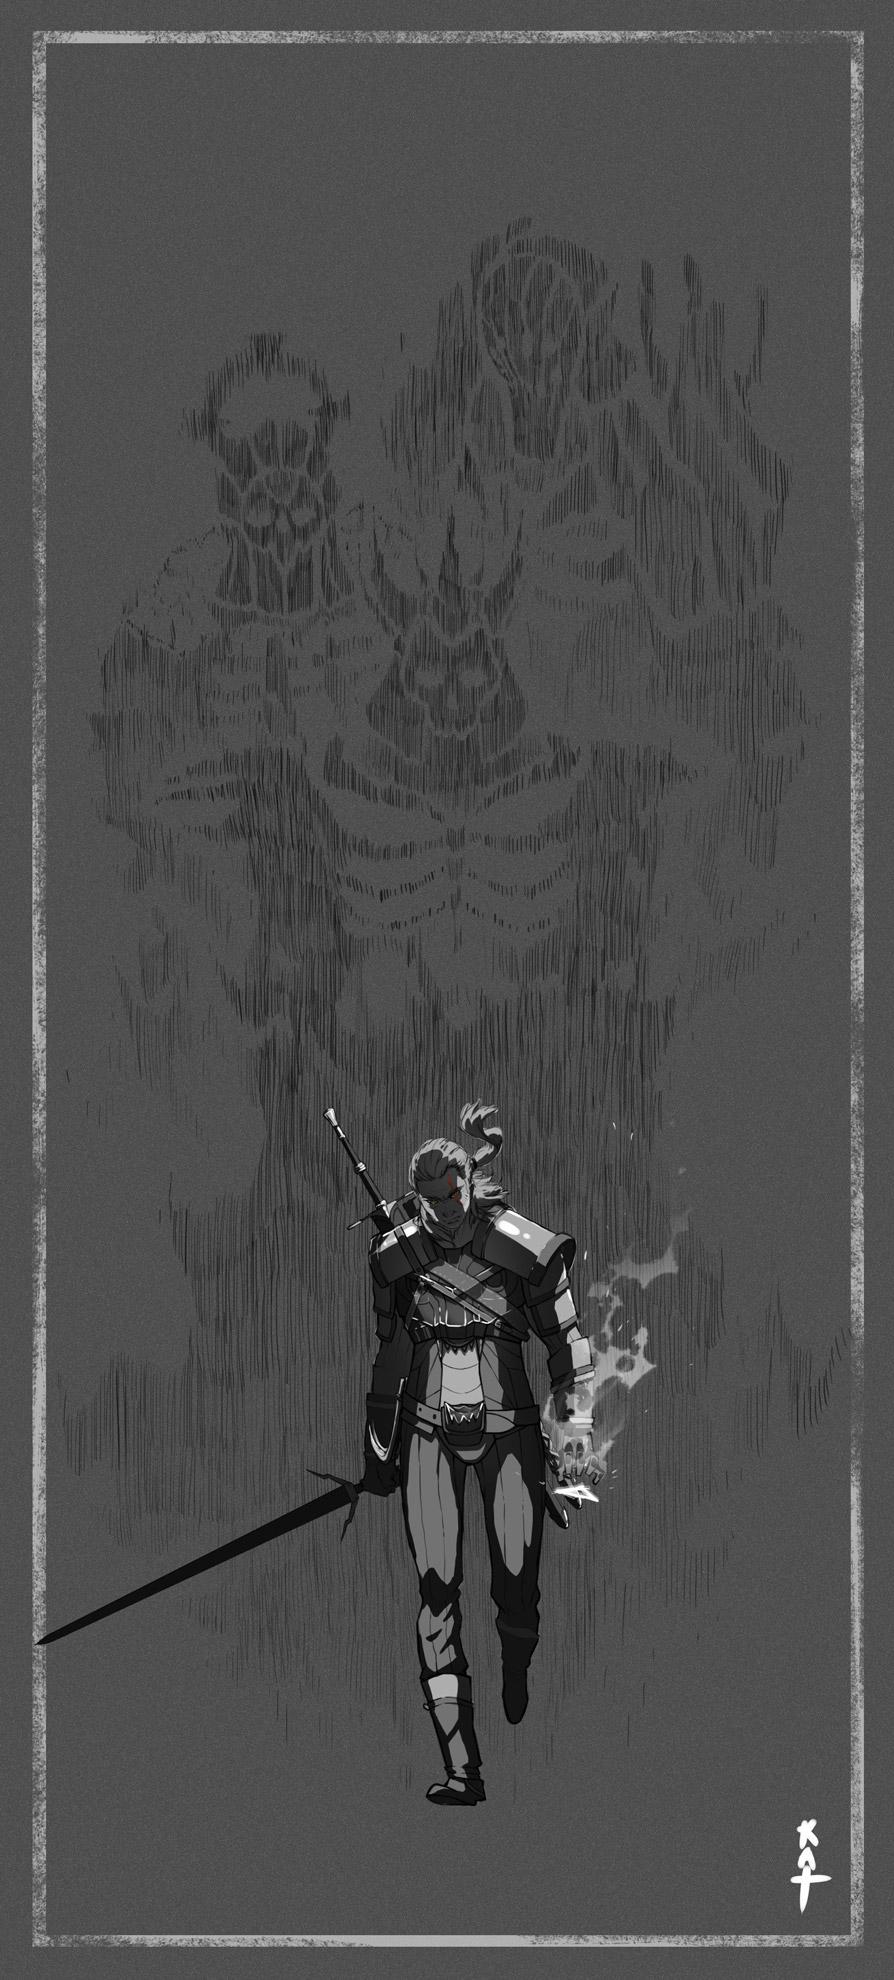 Witcher - illustration - kat-4510 | ello